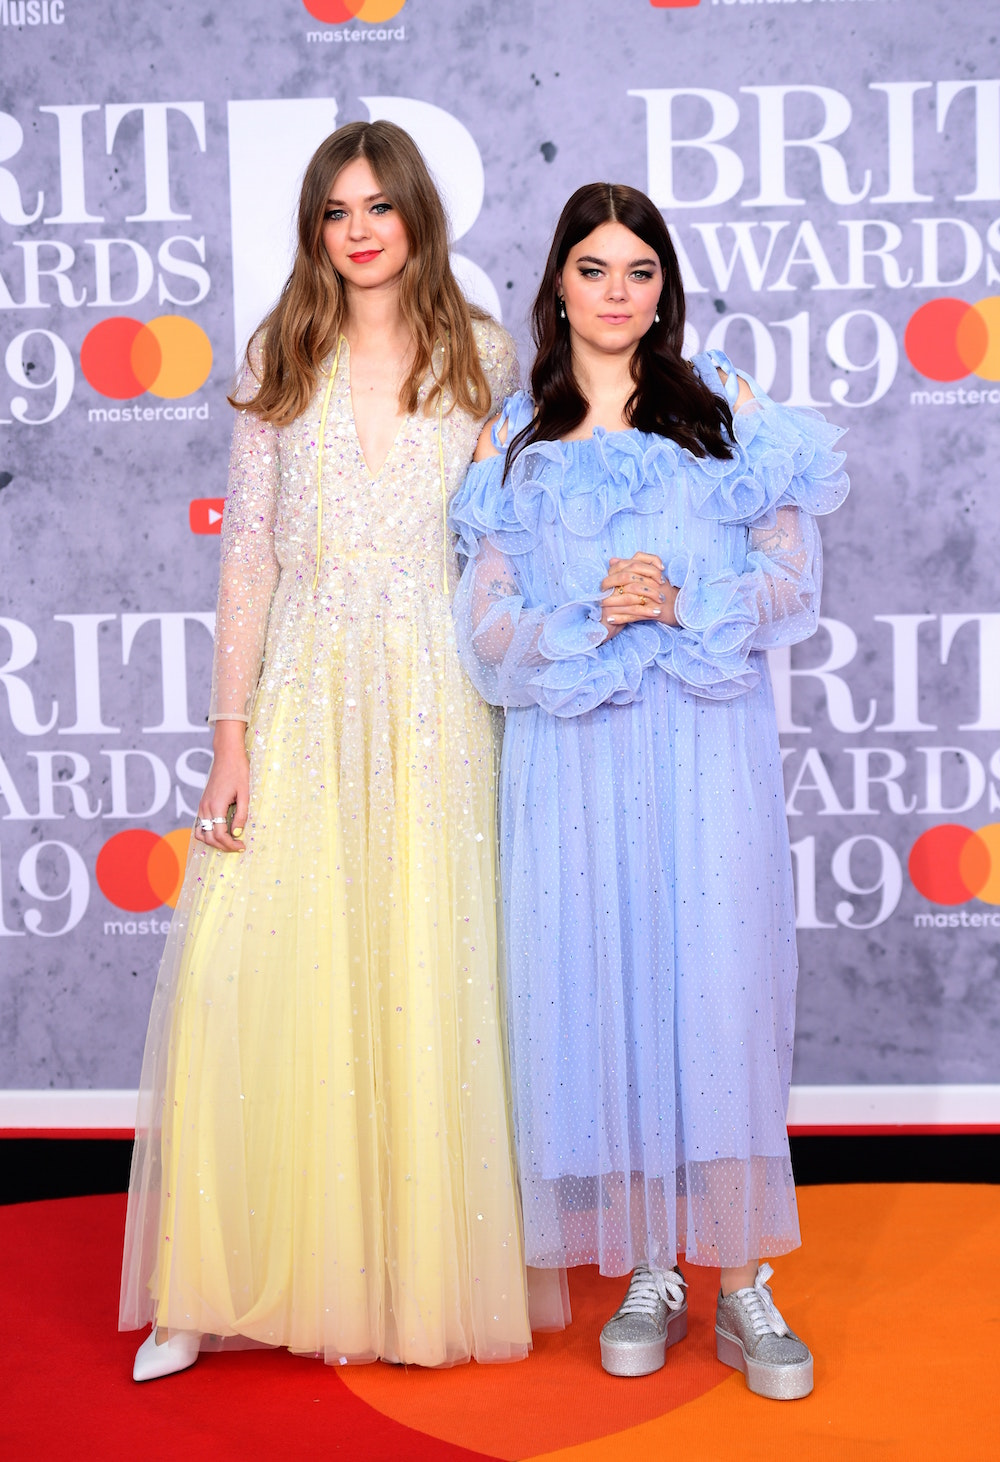 Johanna Soderberg and Klara Soderberg of the band First Aid Kit at this years Brit Awards (Ian West/PA)